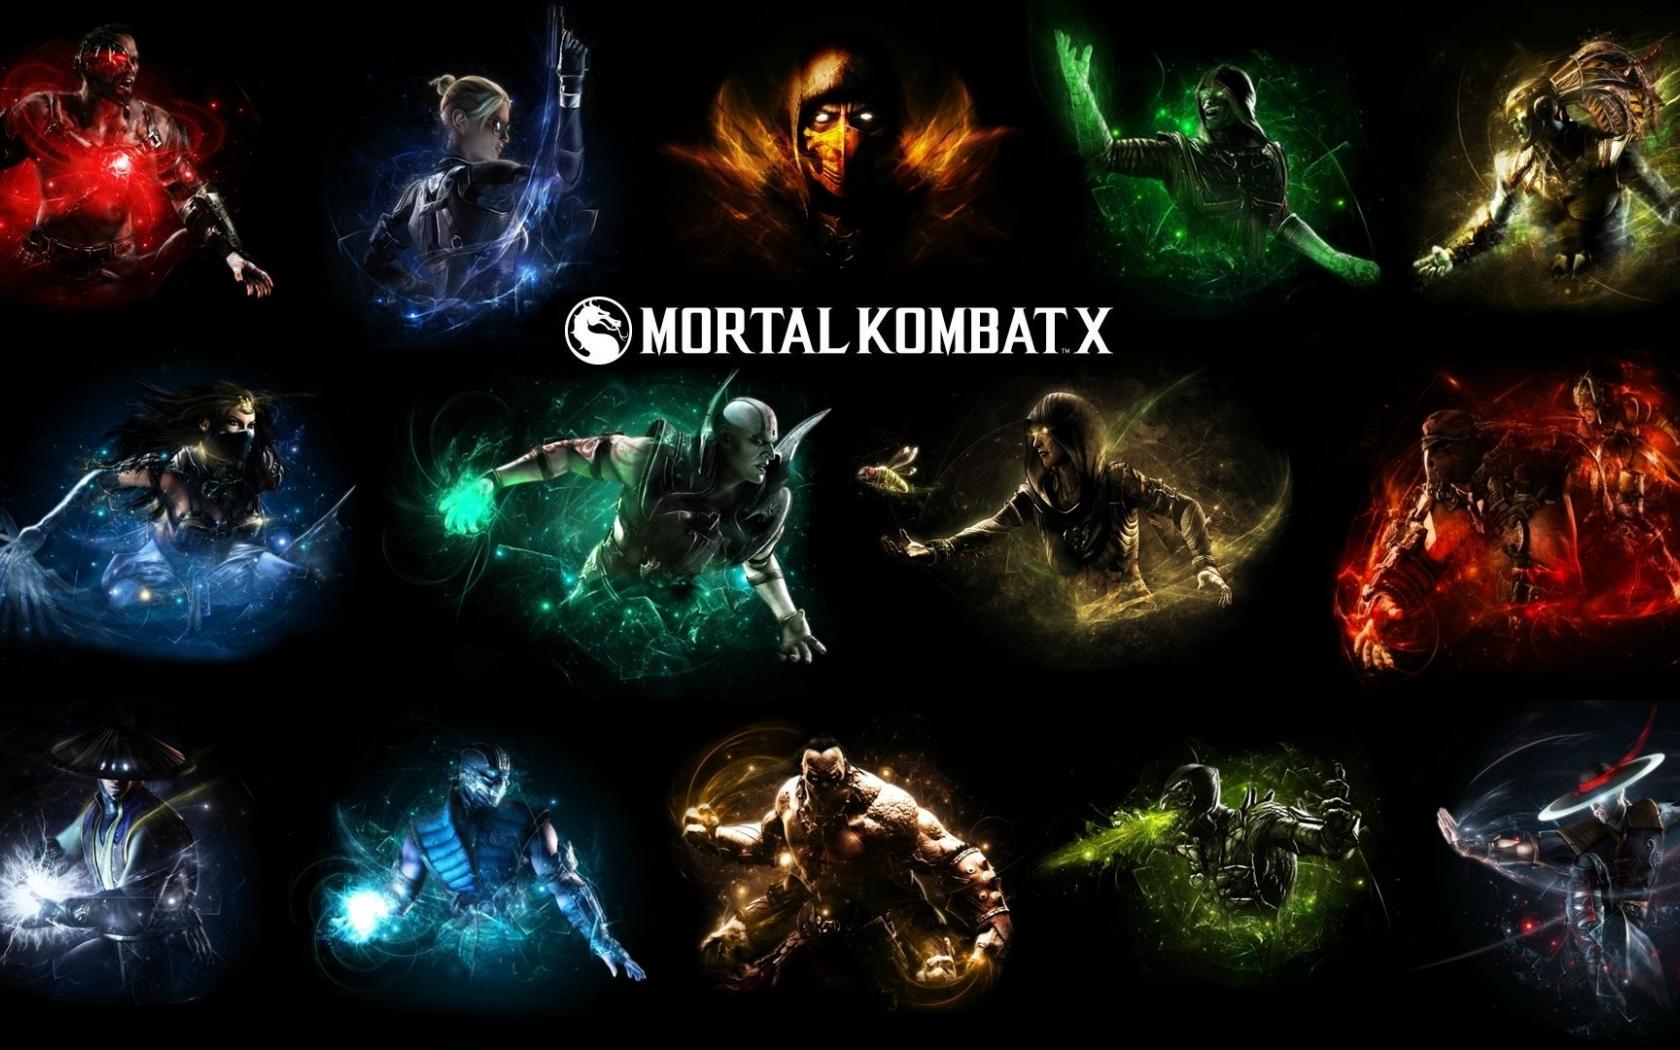 Free Download Mortal Kombat X Characters Wallpapers 44 Mortal